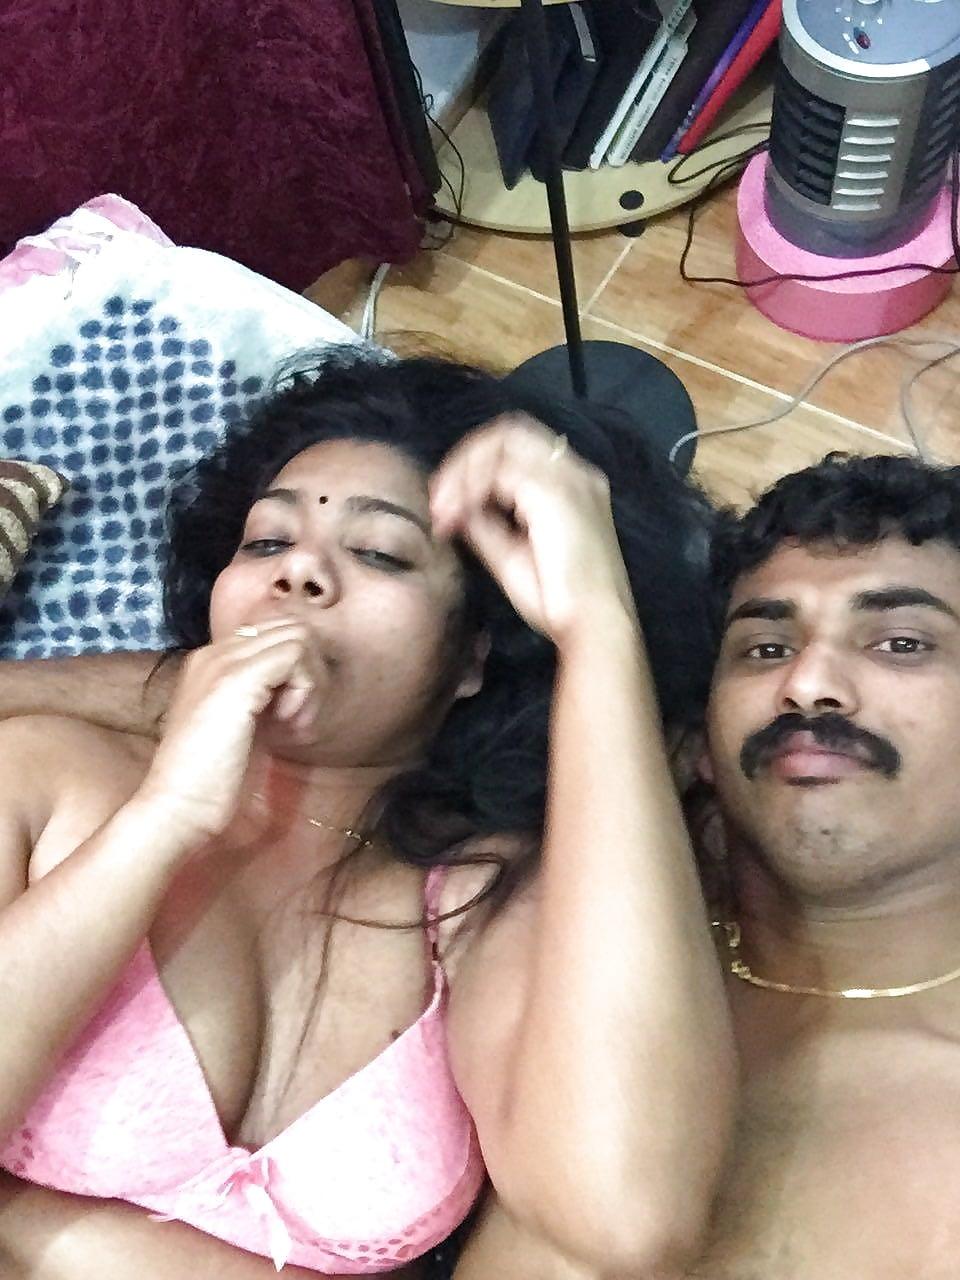 sexcom-mallu-couple-having-sex-gangbang-hand-puppet